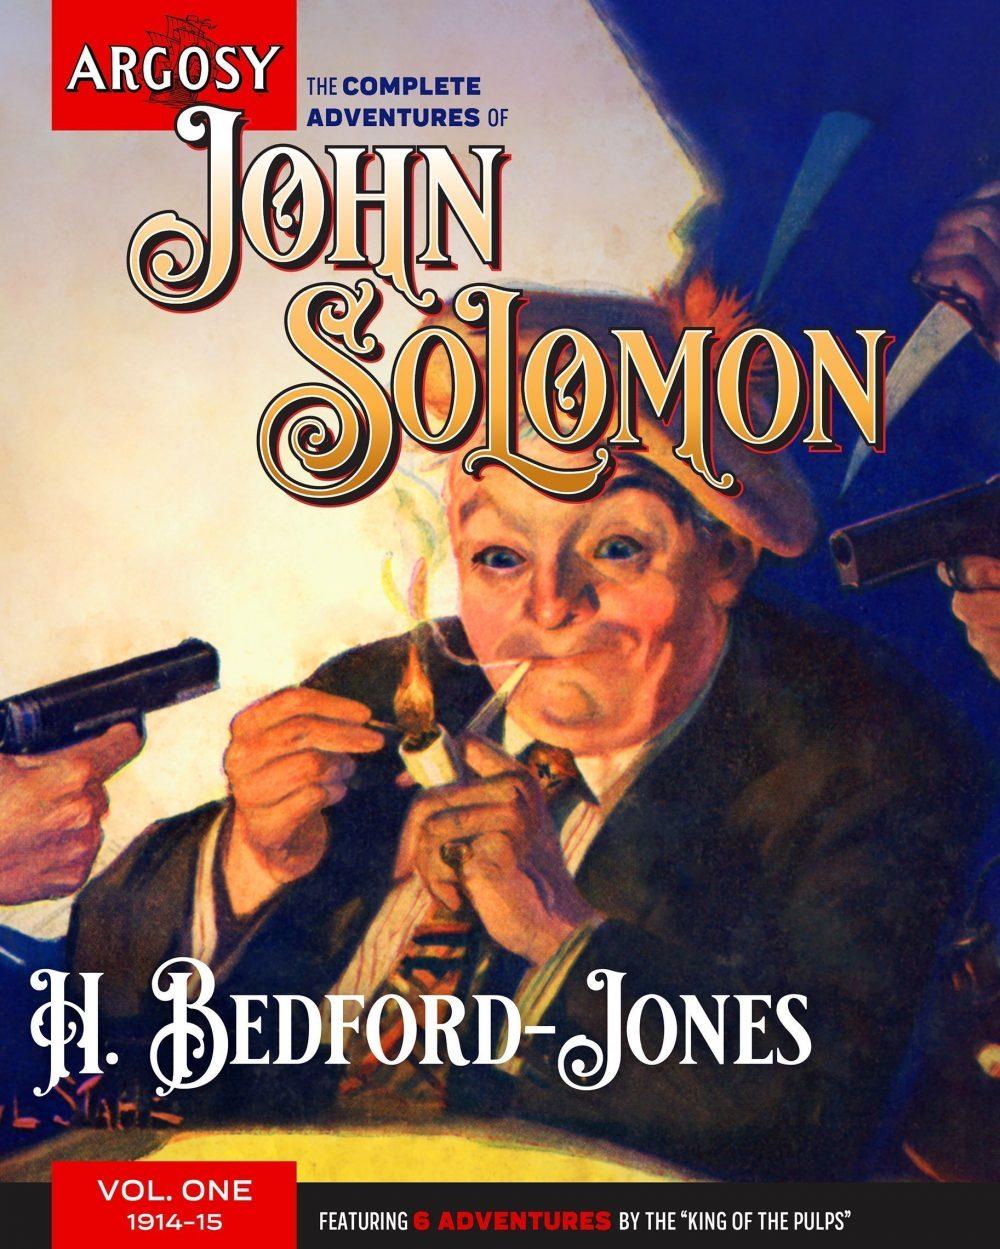 The Complete Adventures of John Solomon, Volume 1: 1914-15